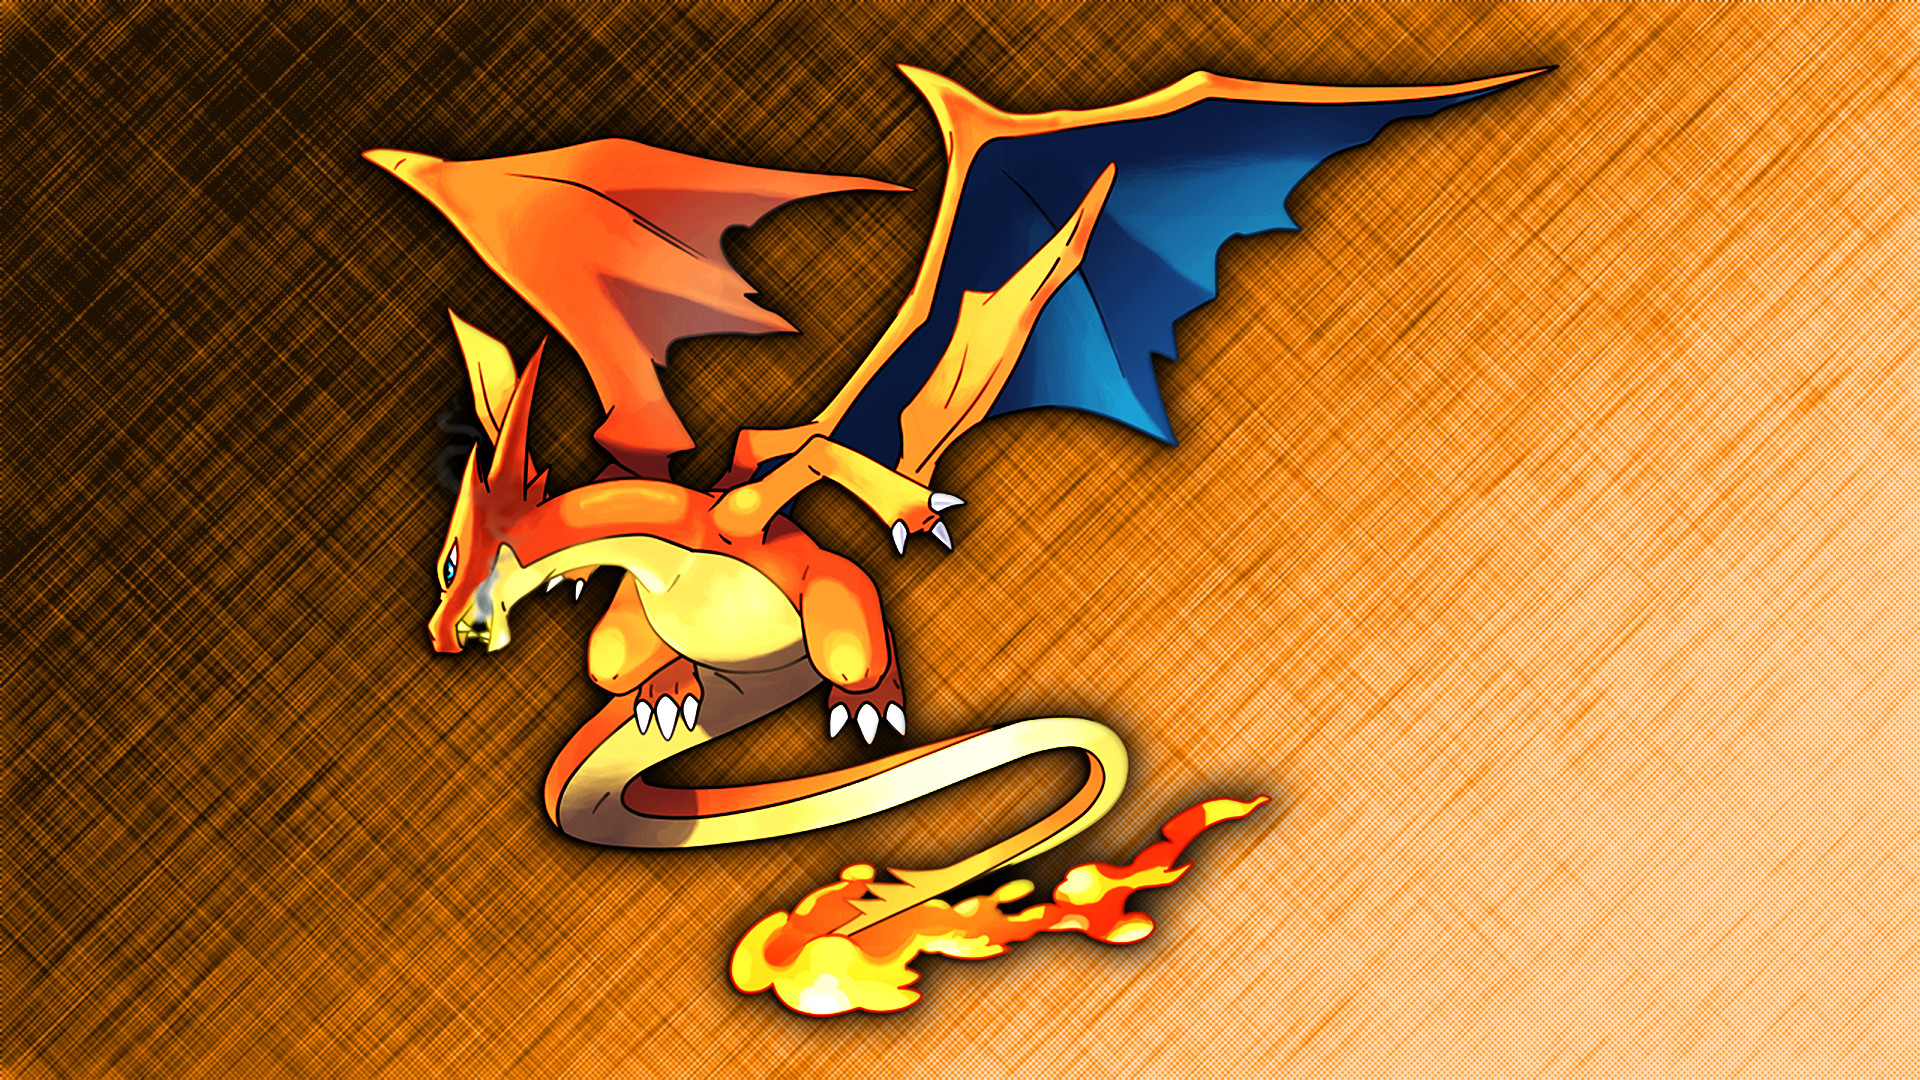 Pokemon Wallpaper Charizard Shiny Mega charizard y wallpaper by